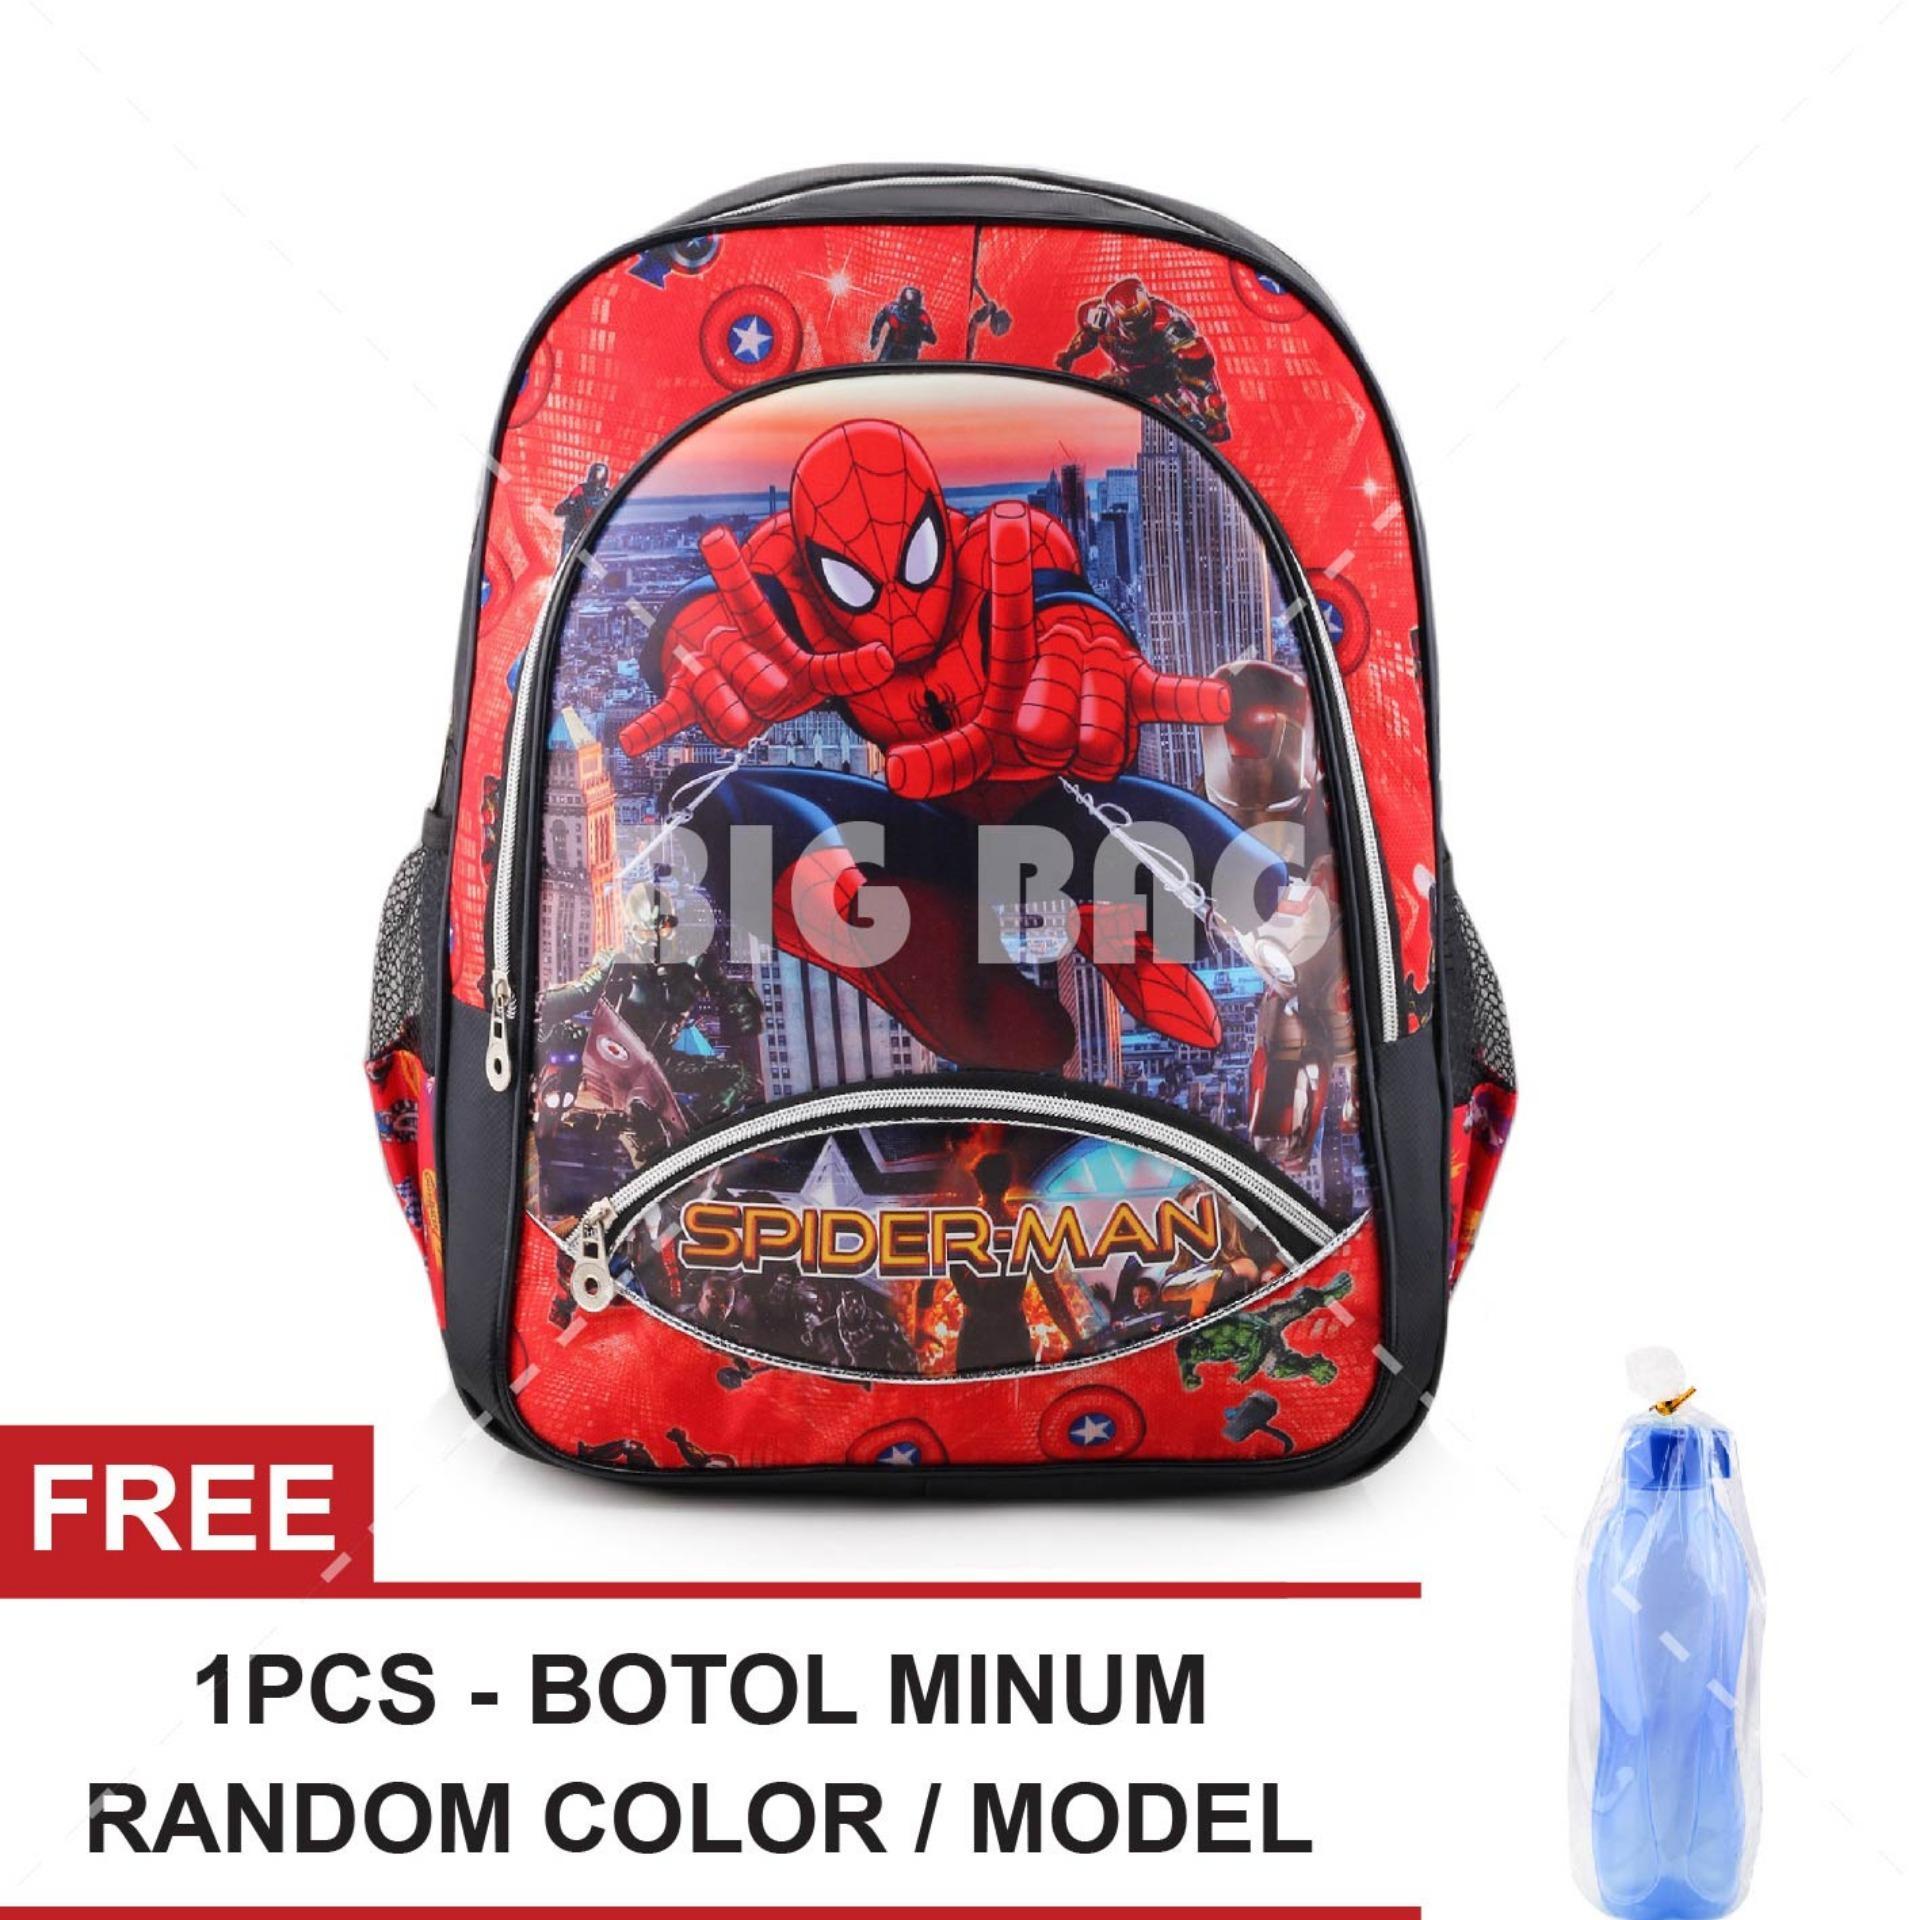 Promo Tas Ransel Anak Spider Man Flying High Sch**l Bag Tas Sekolah Anak Red Free Botol Minum Random Color Model Jawa Barat